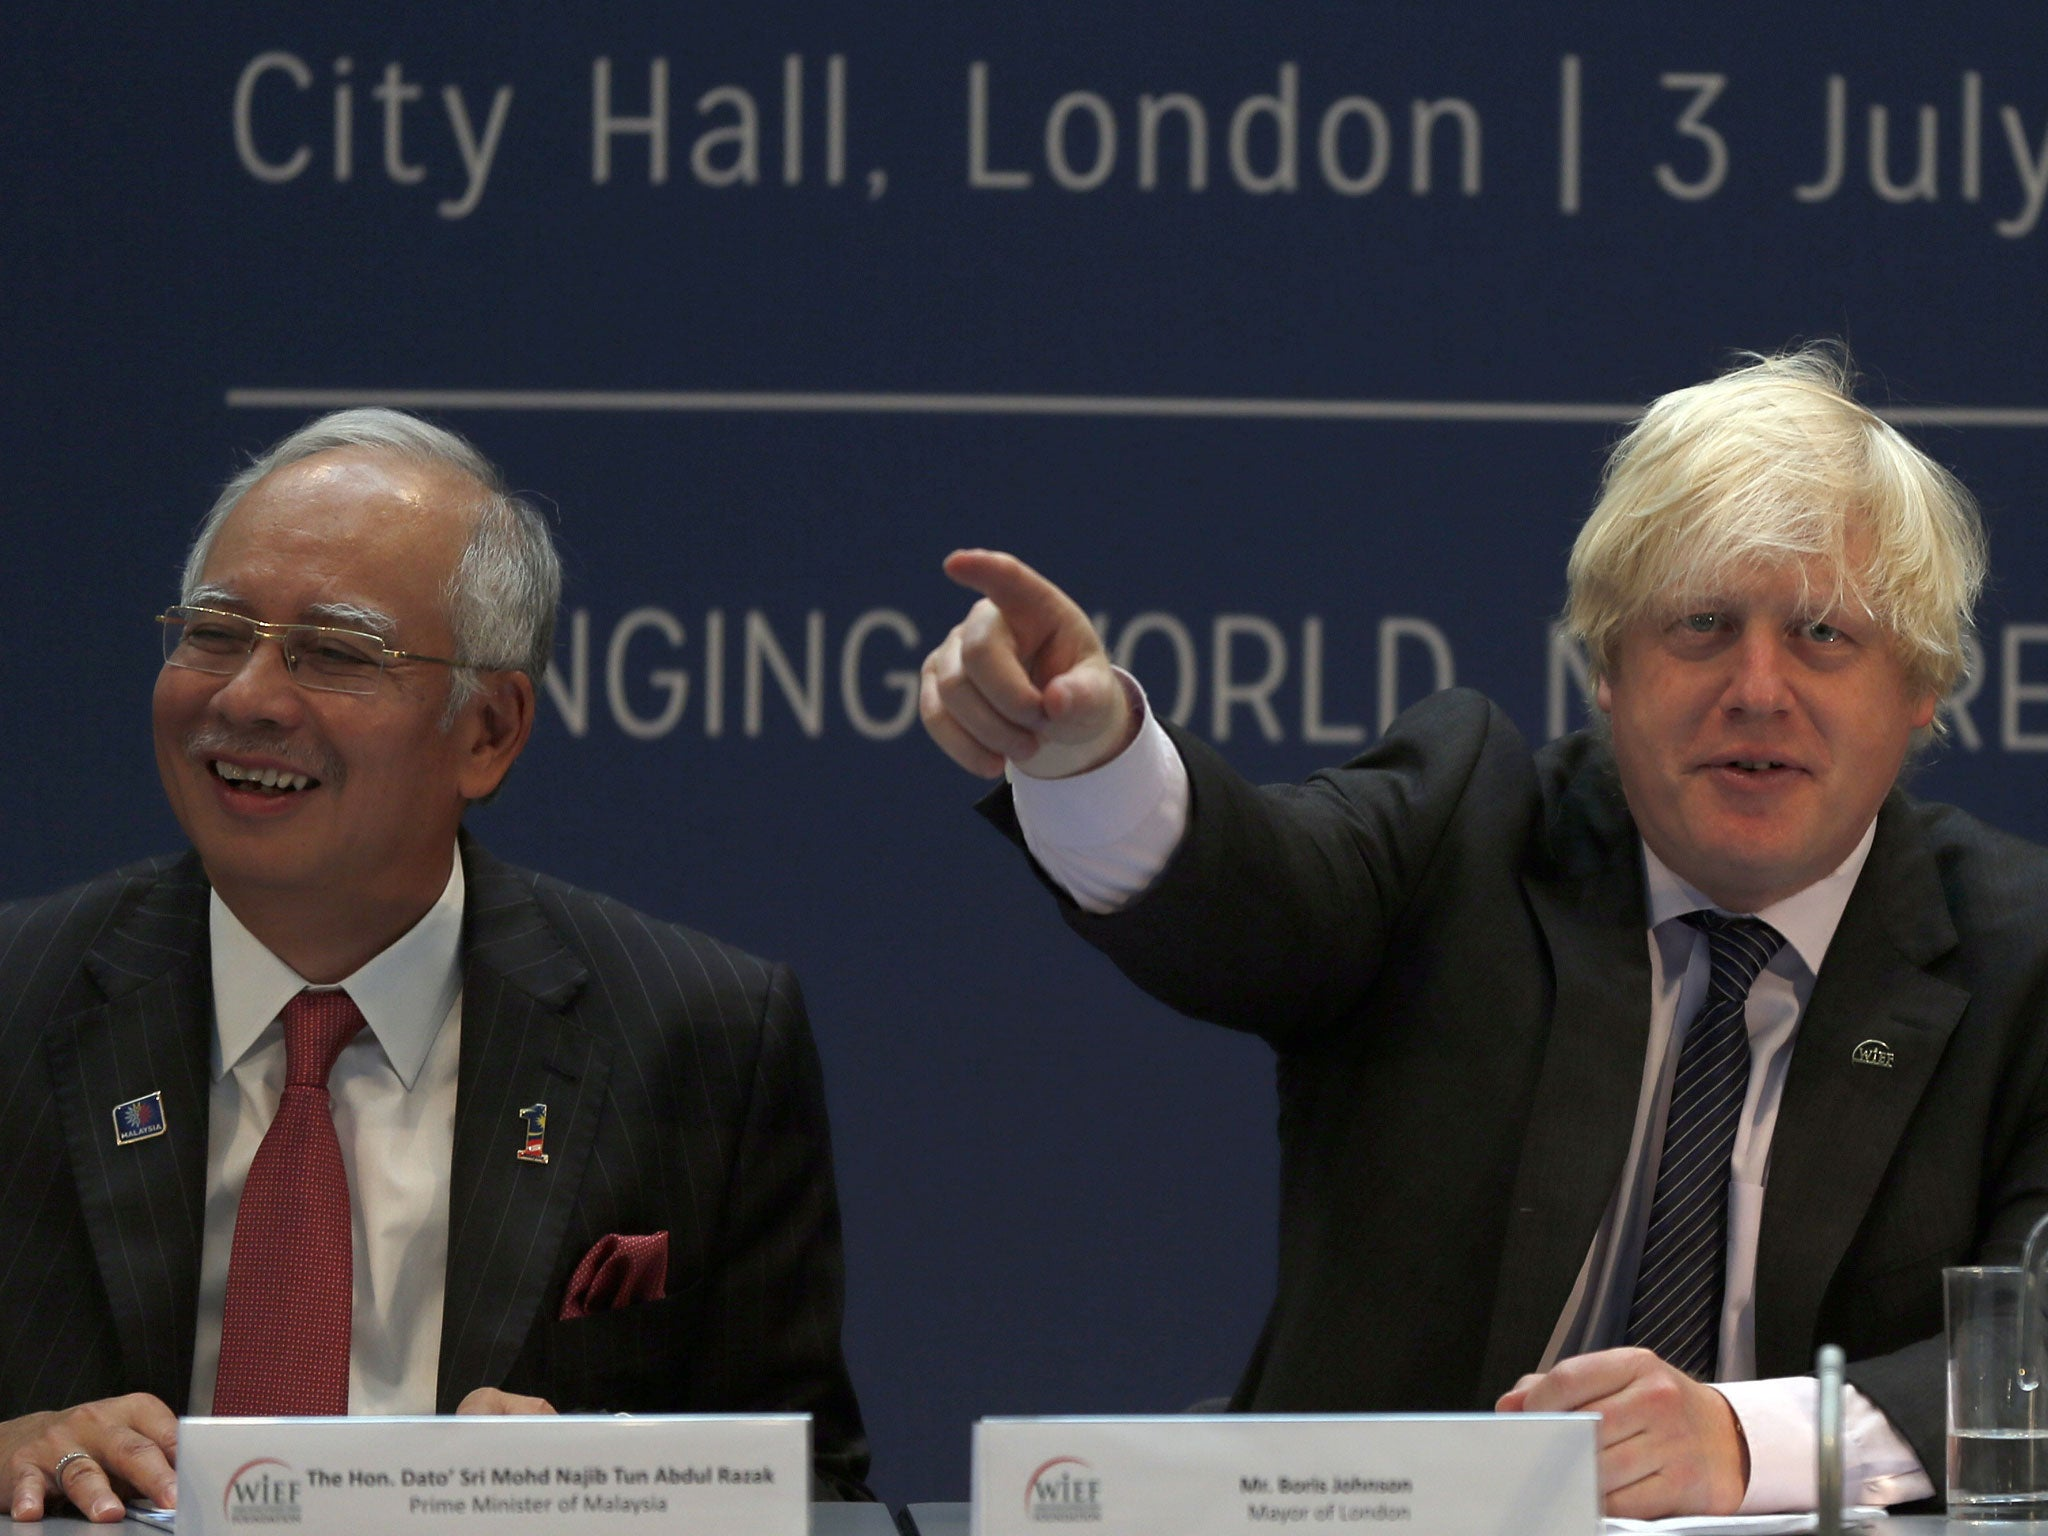 Boris Johnson gaffe: Why do women go to university? To find men to